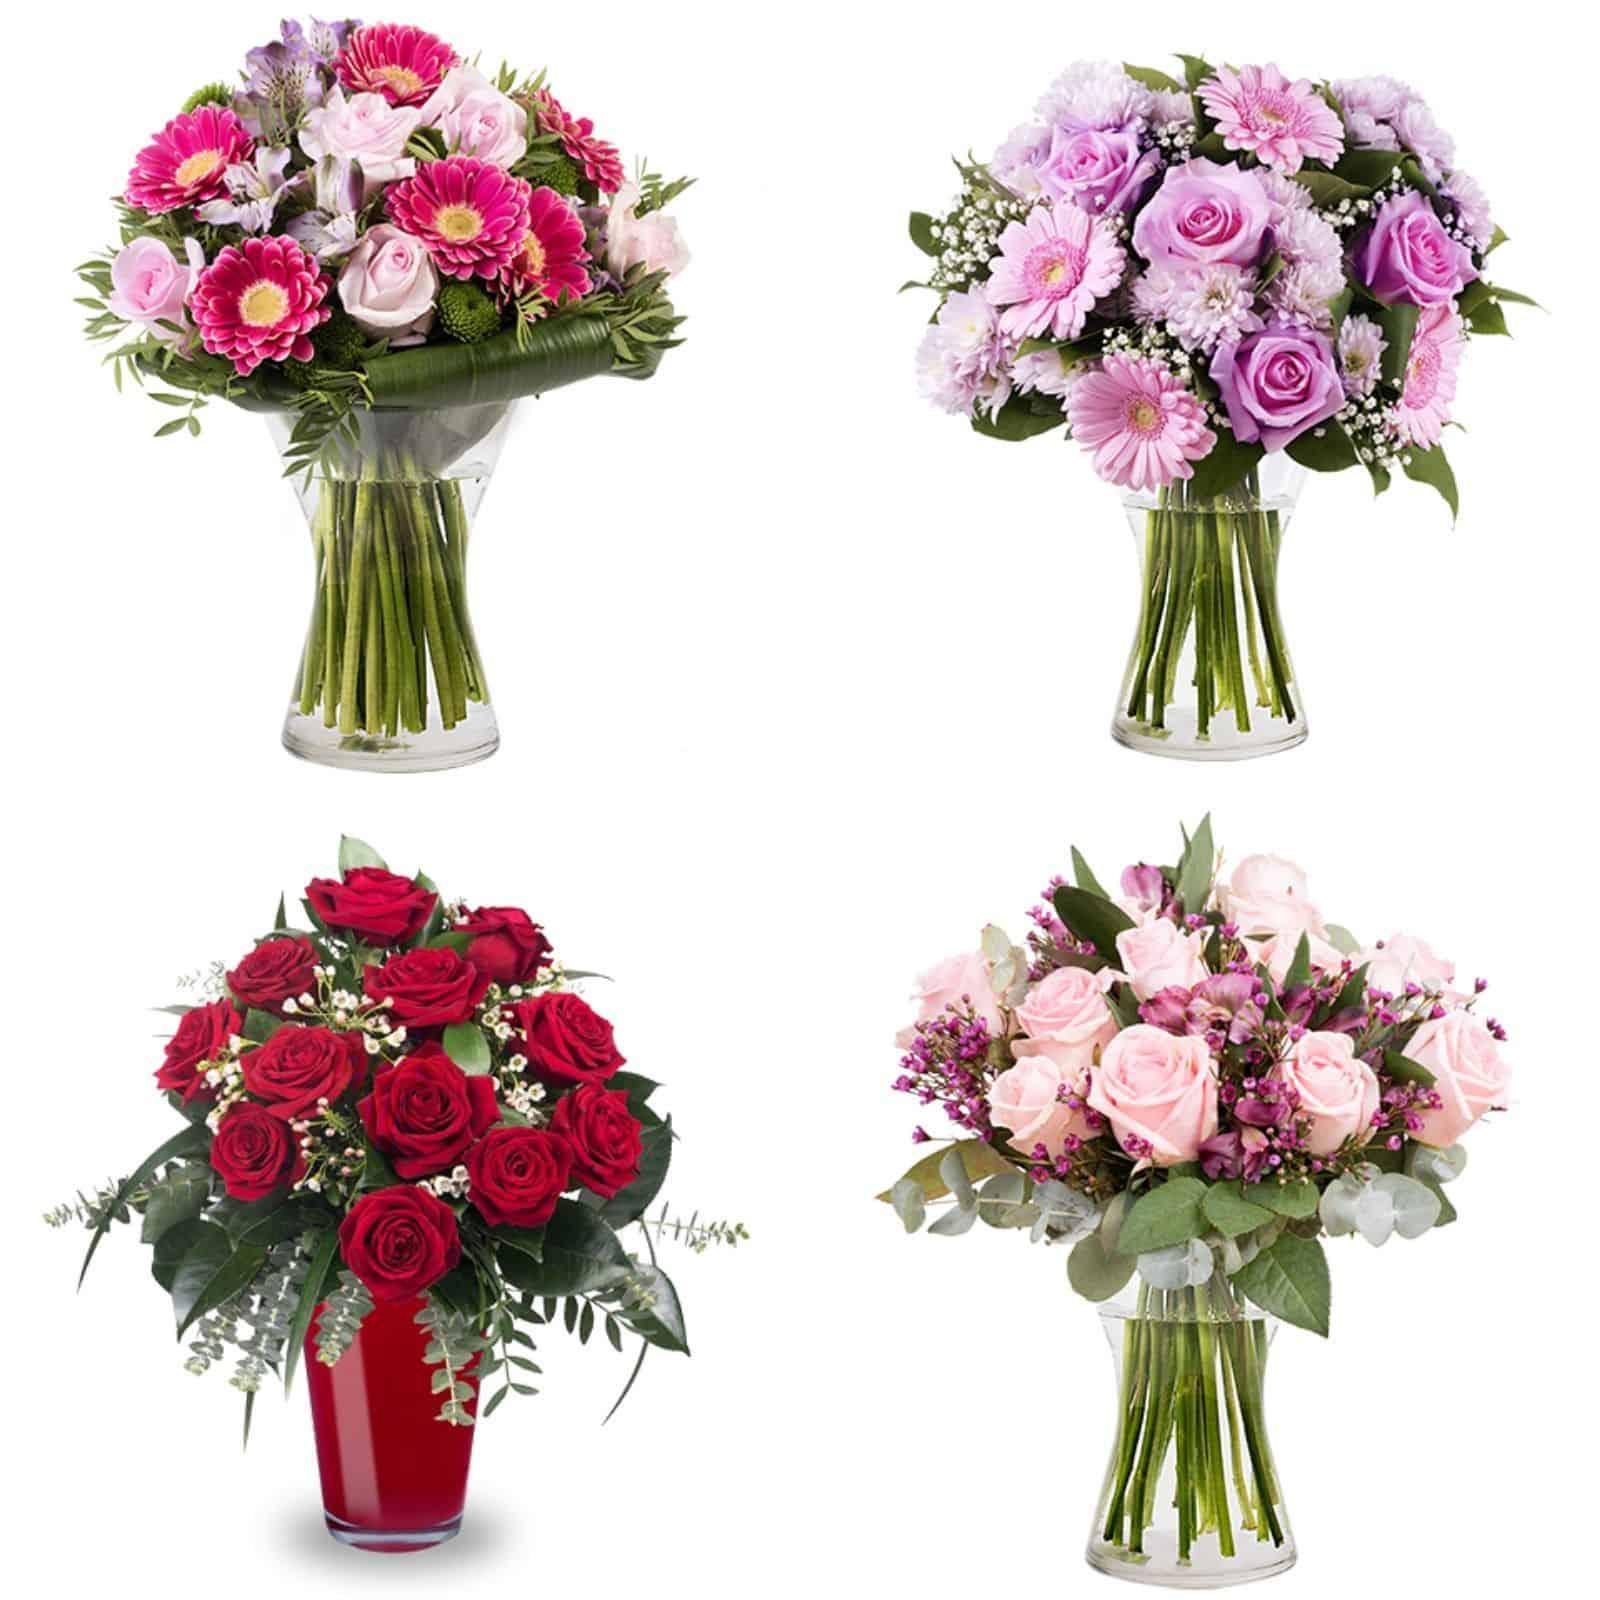 Blumenversand USA - Floraqueen - Blumen verschicken USA